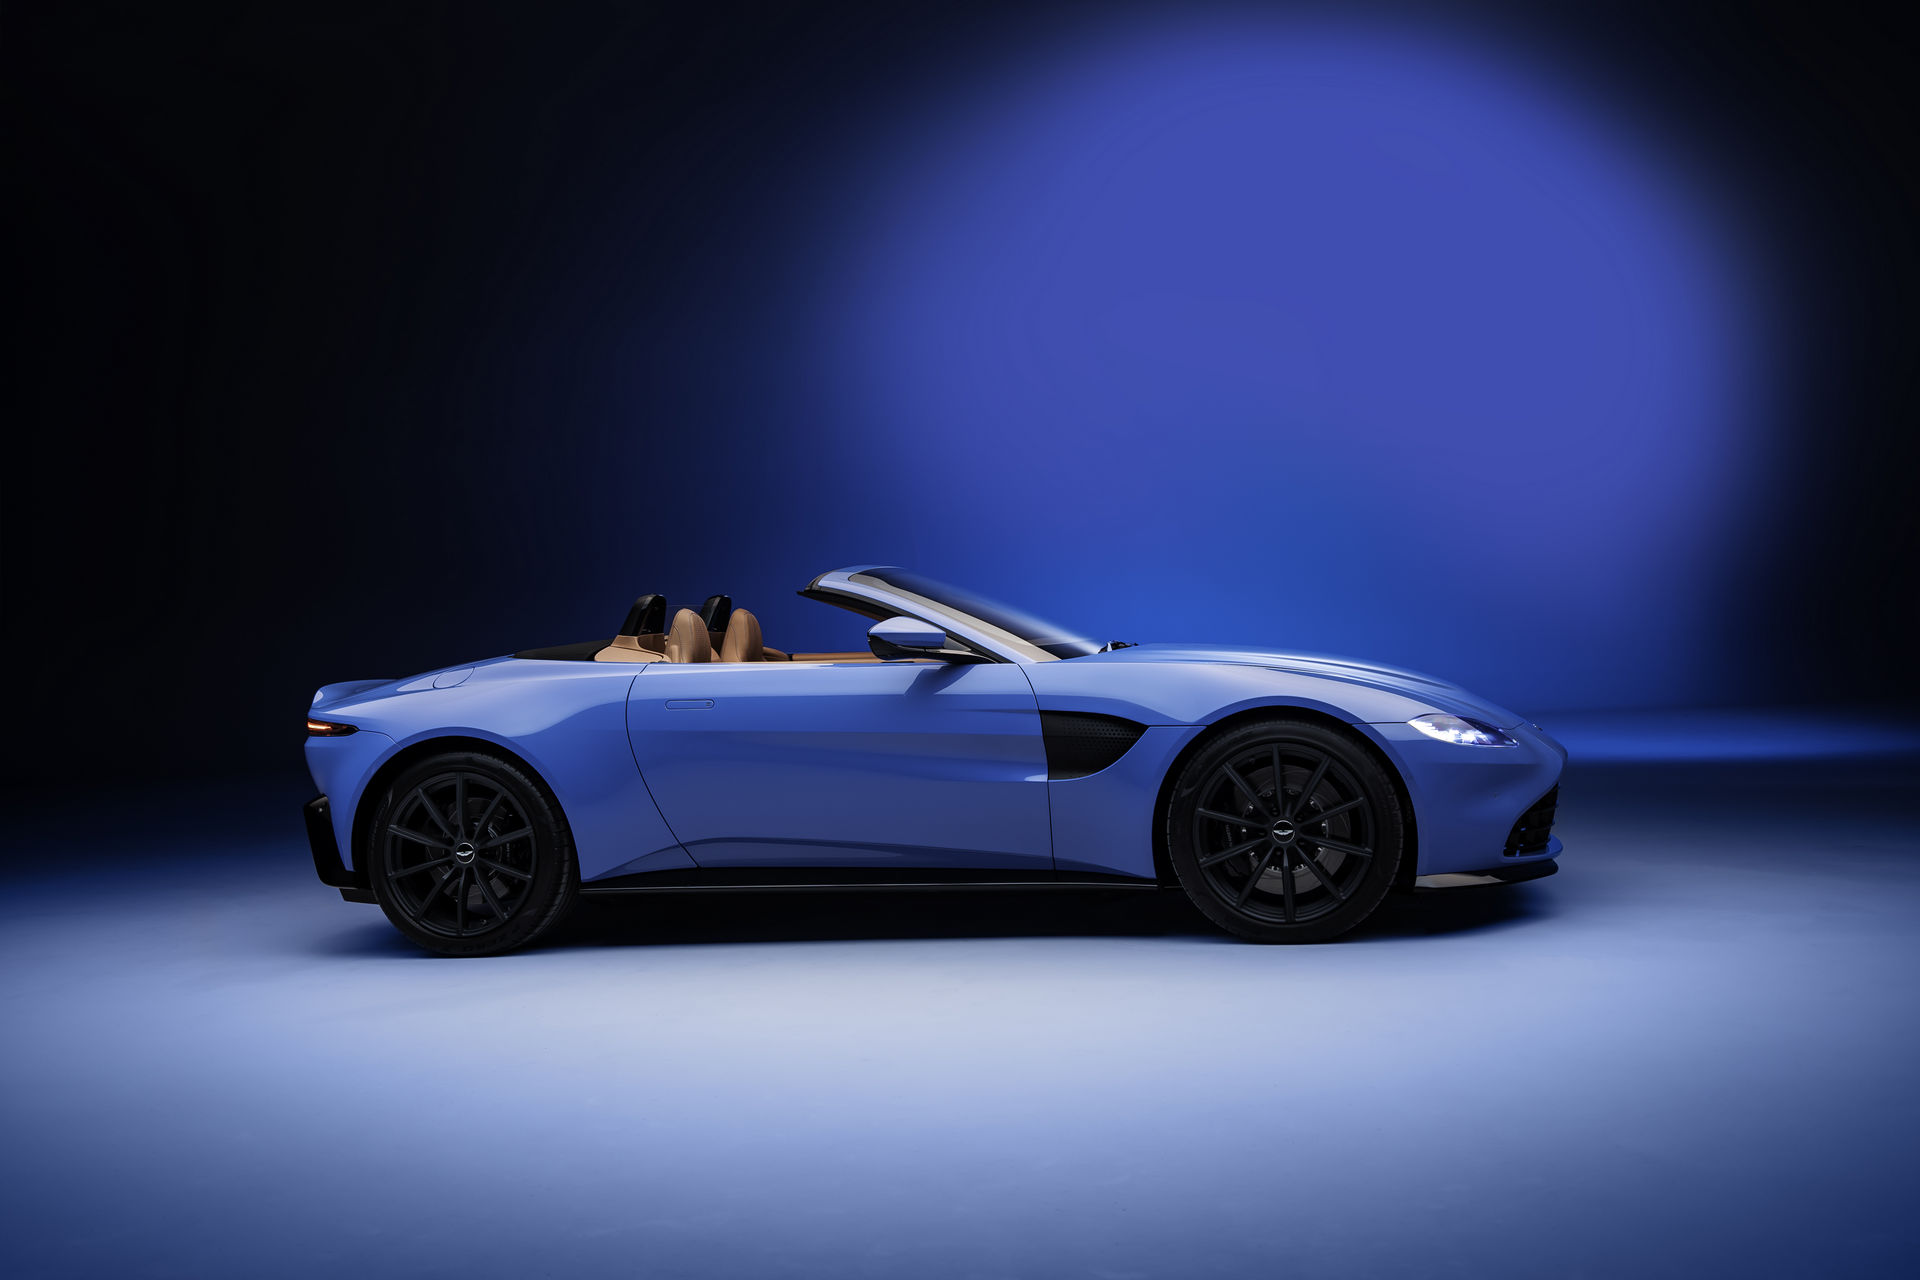 2021 Aston Martin V8 Vantage Roadster Boasts World S Fastest Folding Soft Top Autoevolution